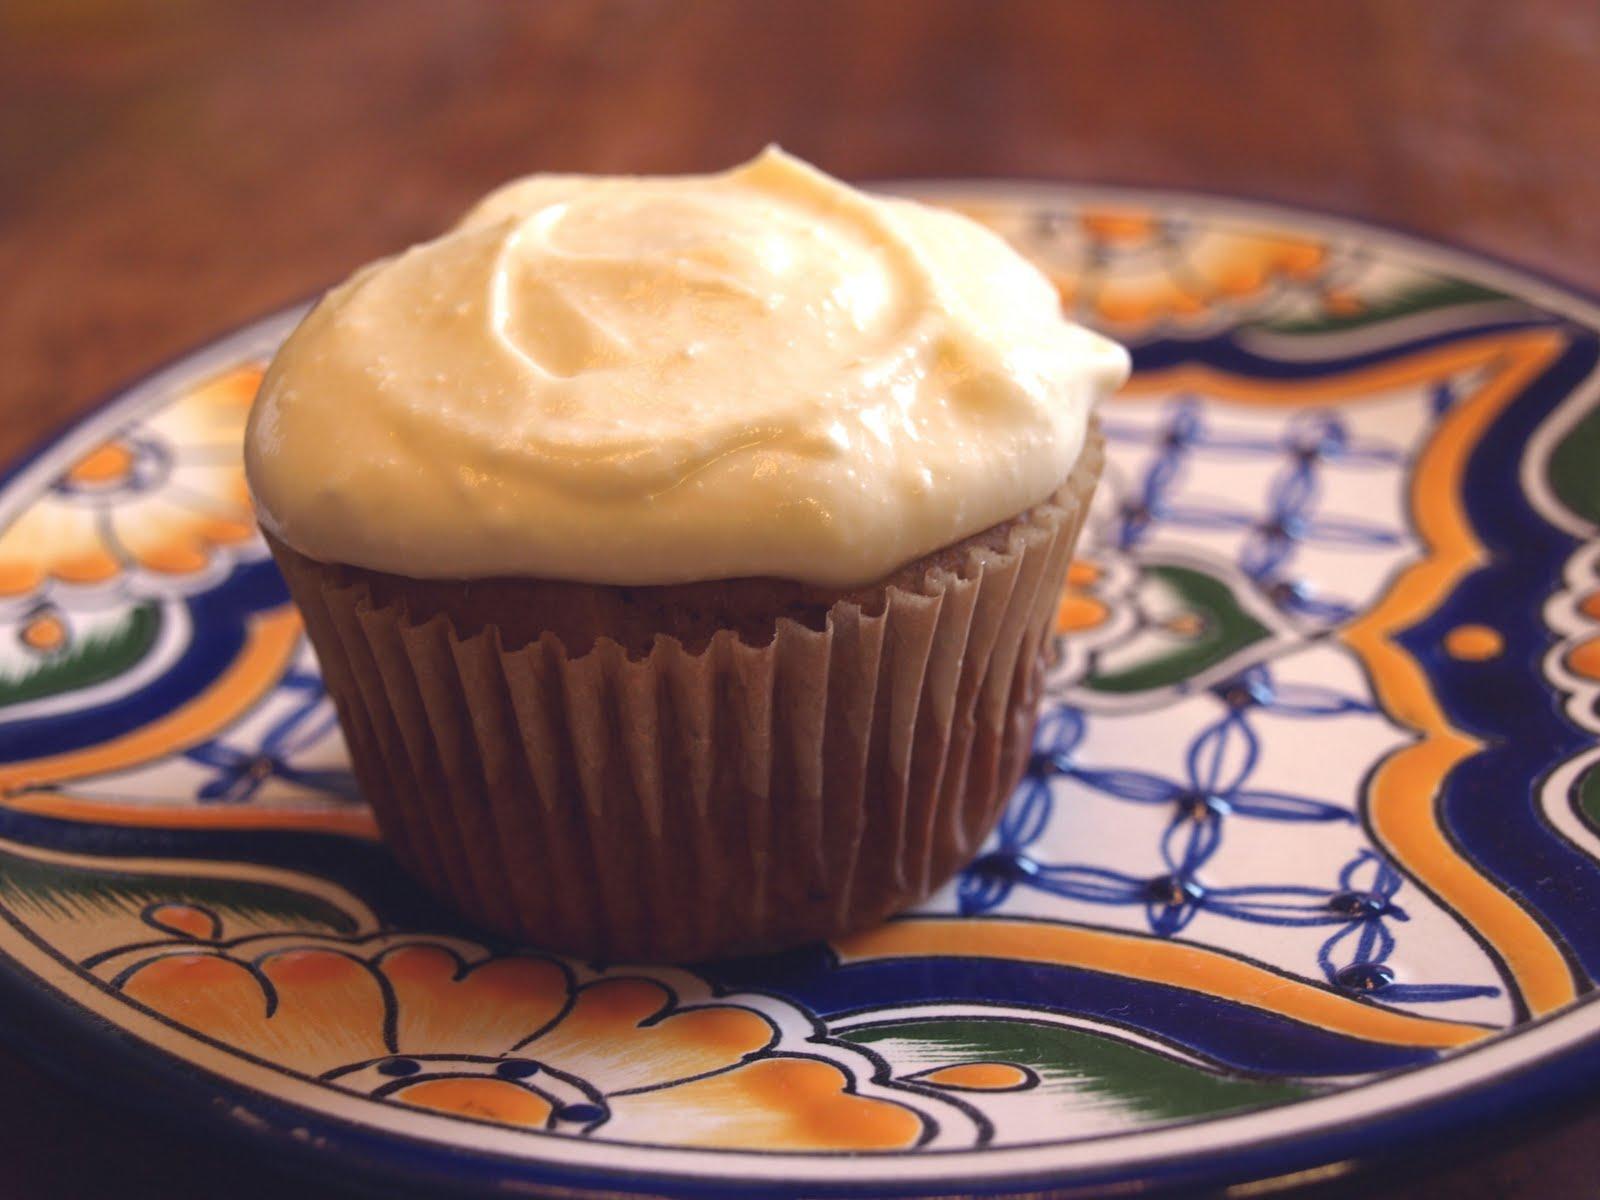 Grain-Free Foodies: Cream Cheese Icing